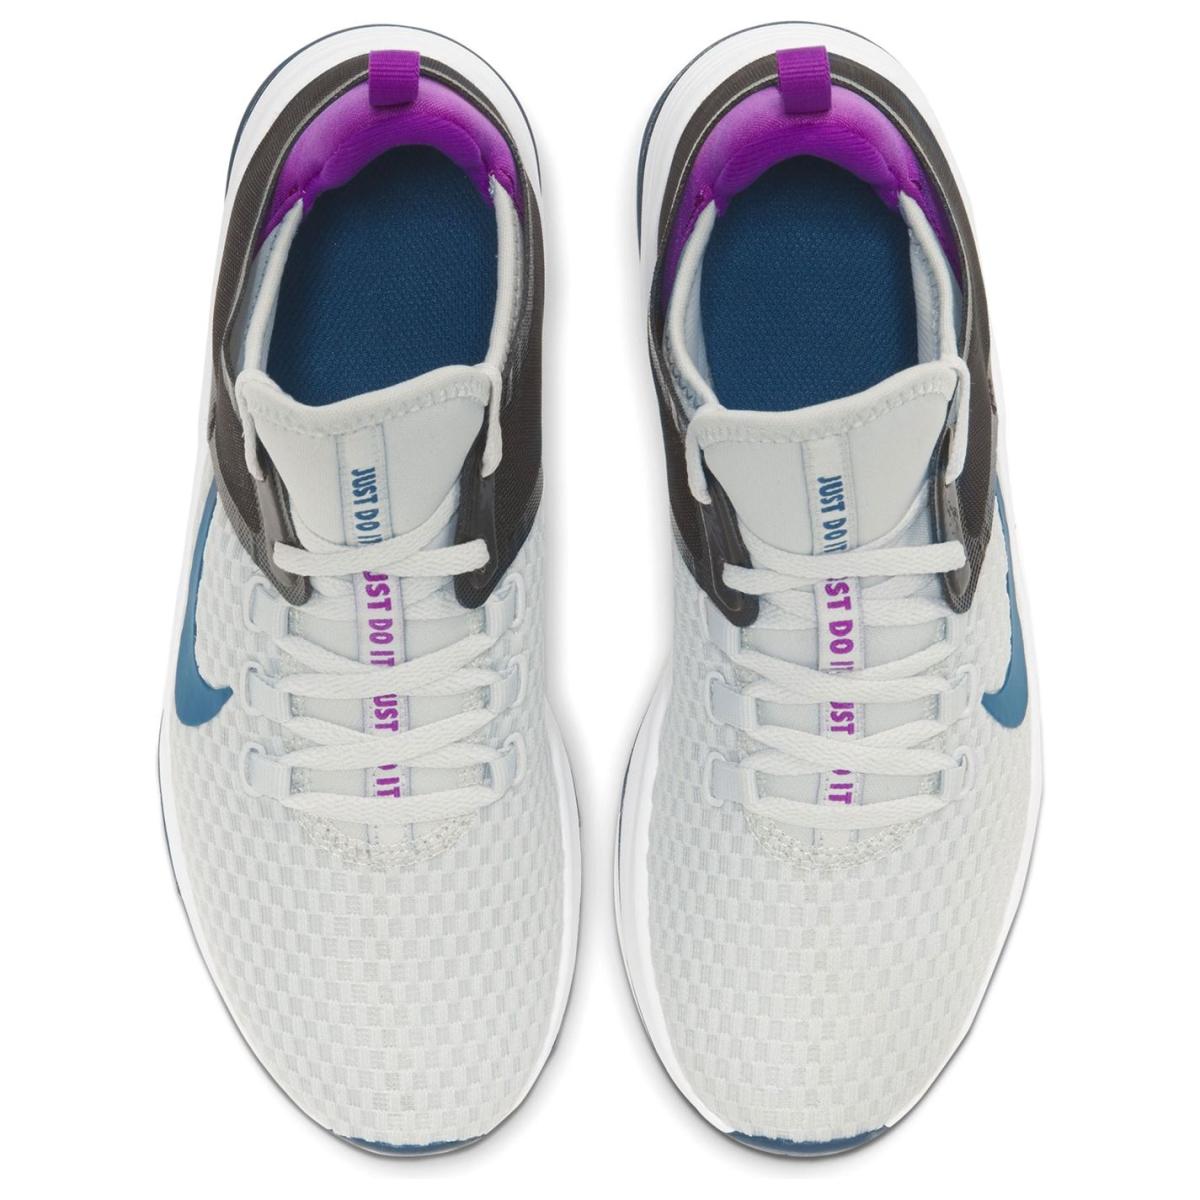 Nike Air Bella 2 Turnschuhe Damen Sneaker Sportschuhe Laufschuhe 3120